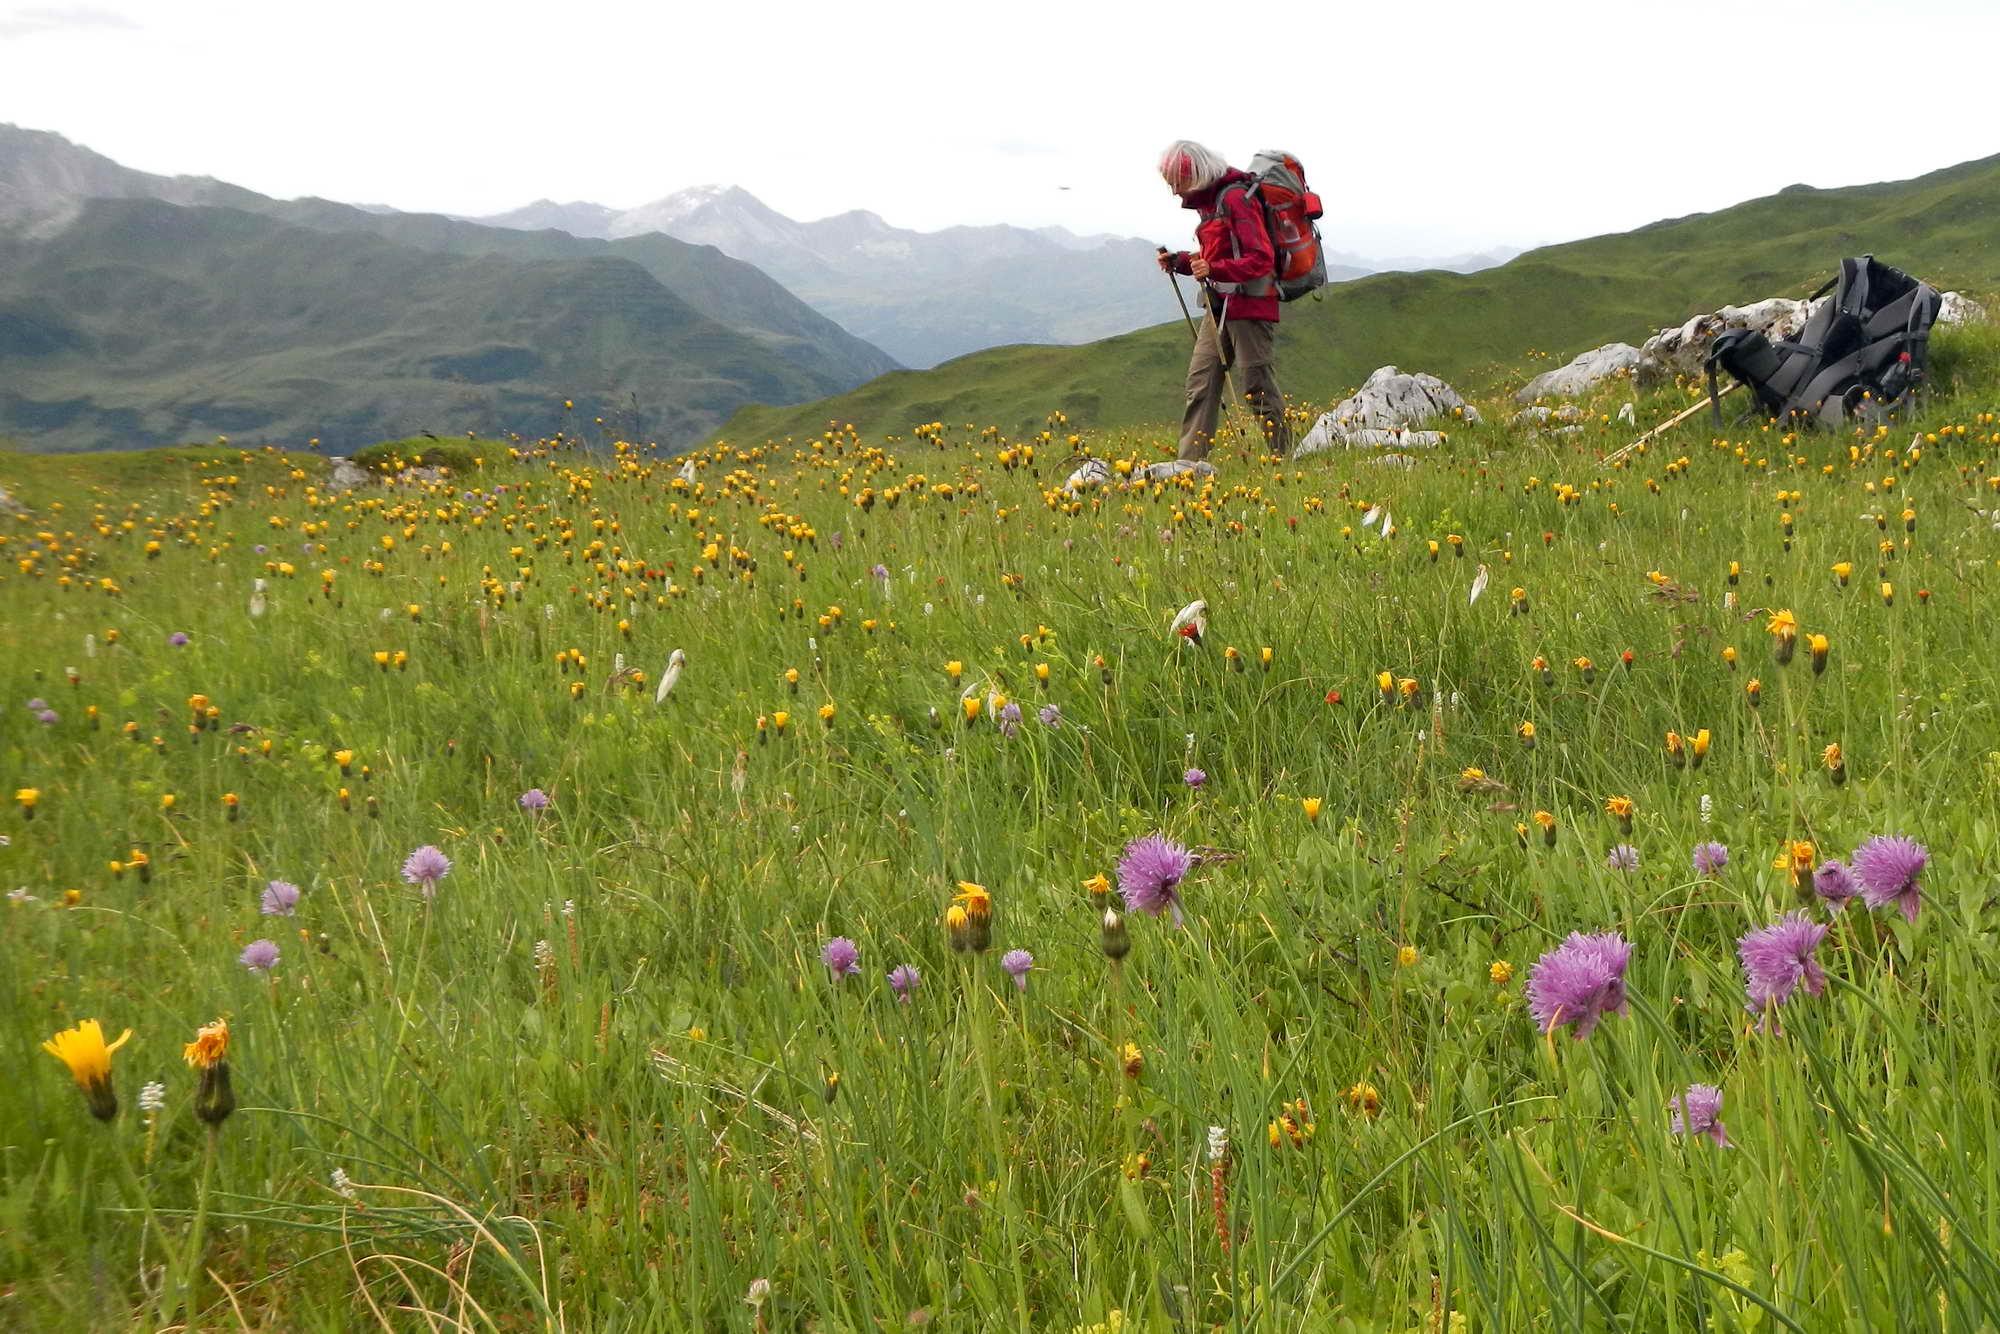 MT 5.3 Carschinahütte > St. Antönien (Graubünden)